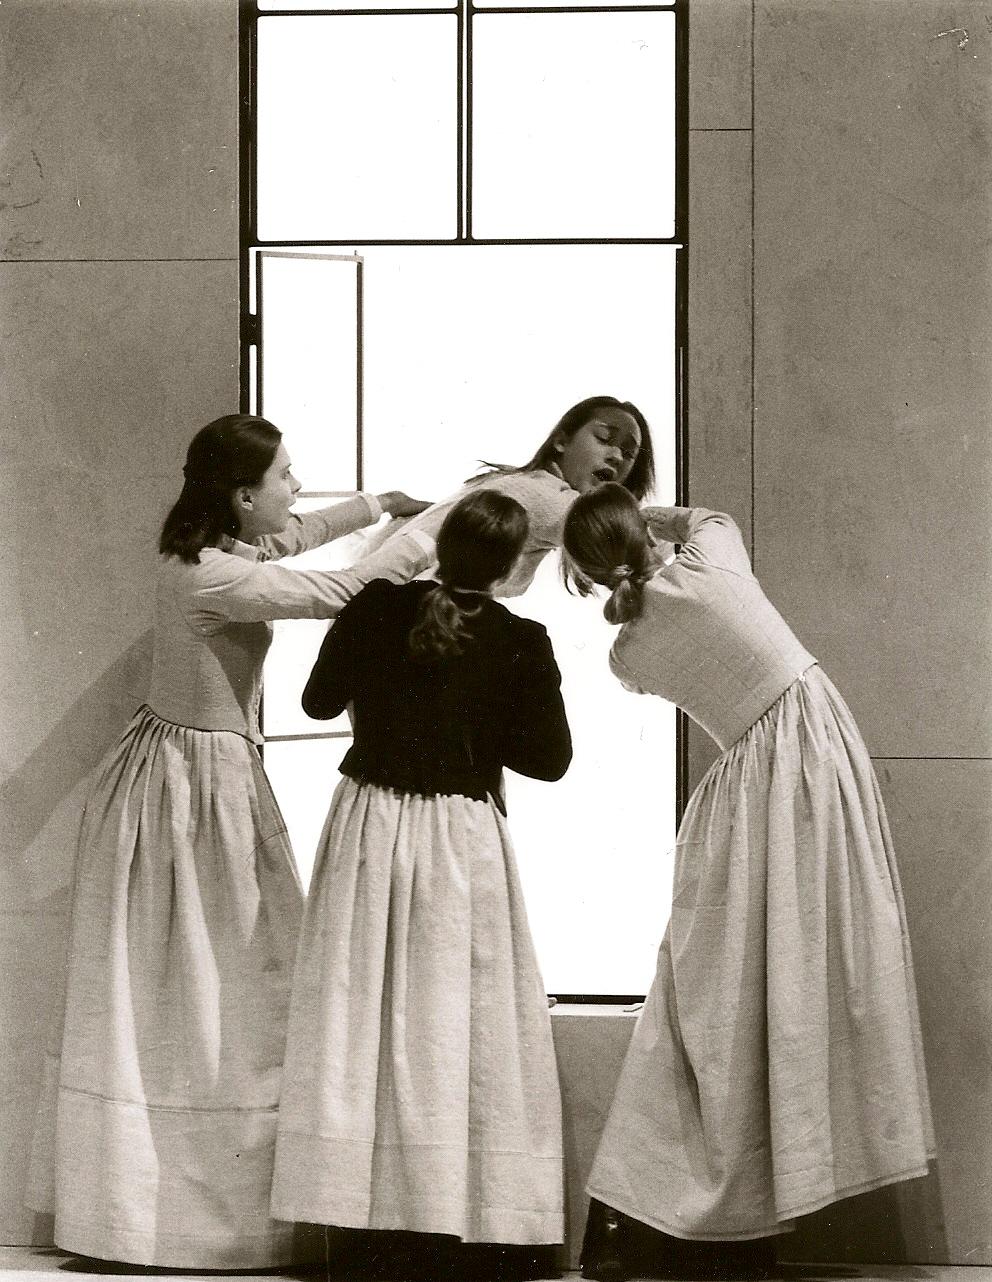 Hexenjagd, 1990, Staatstheater Karlsruhe